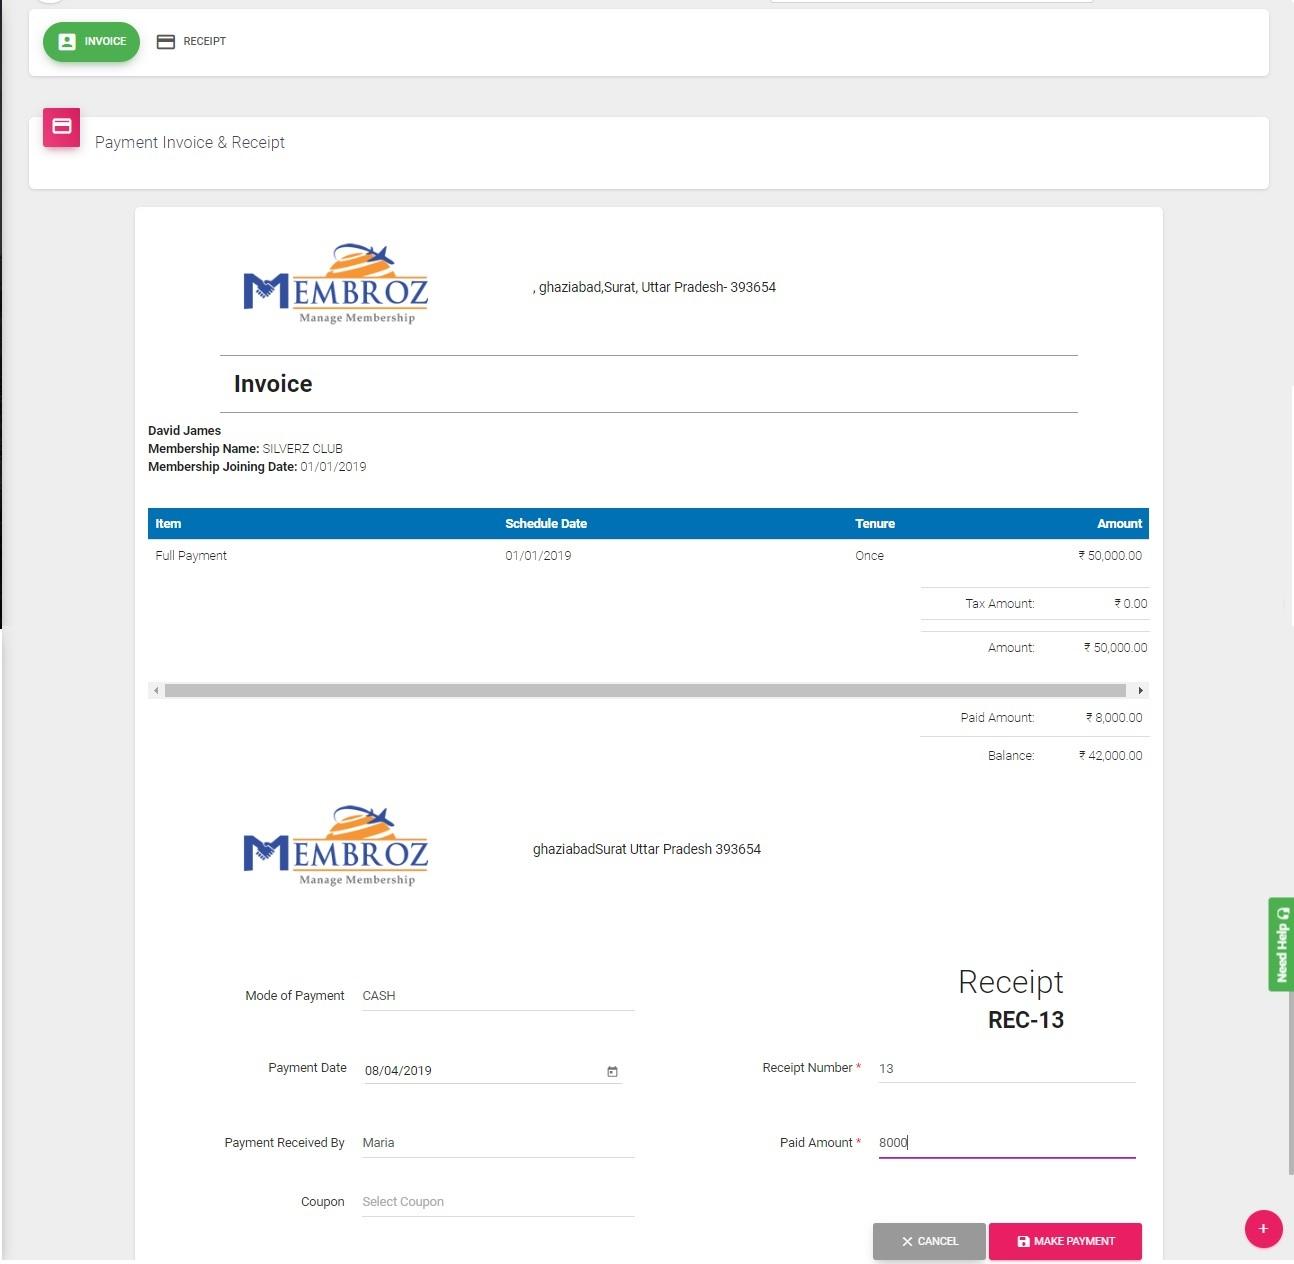 payment invoice & receipt